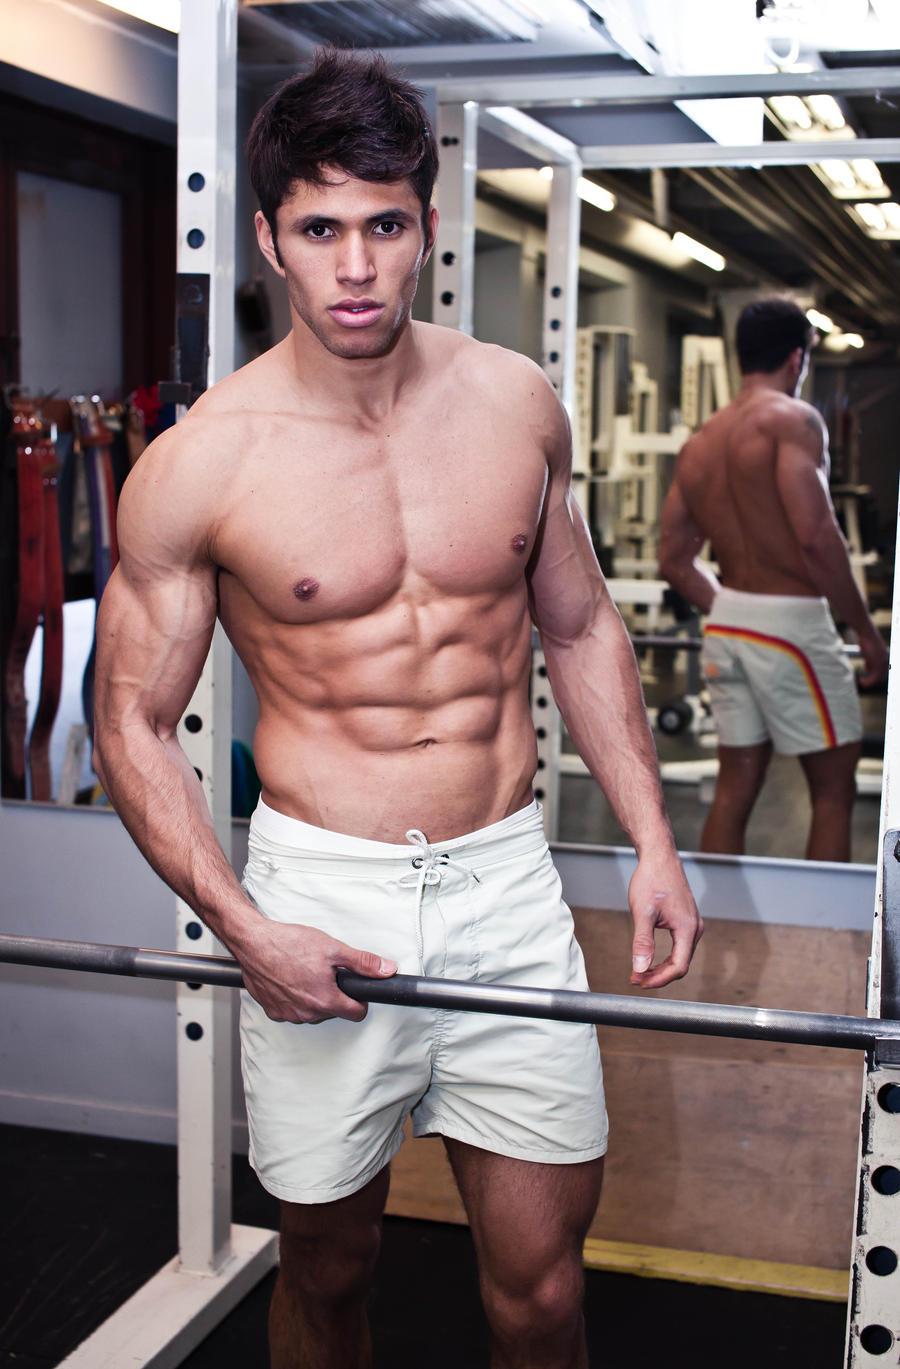 Fitness man 2 by RLPhotographs